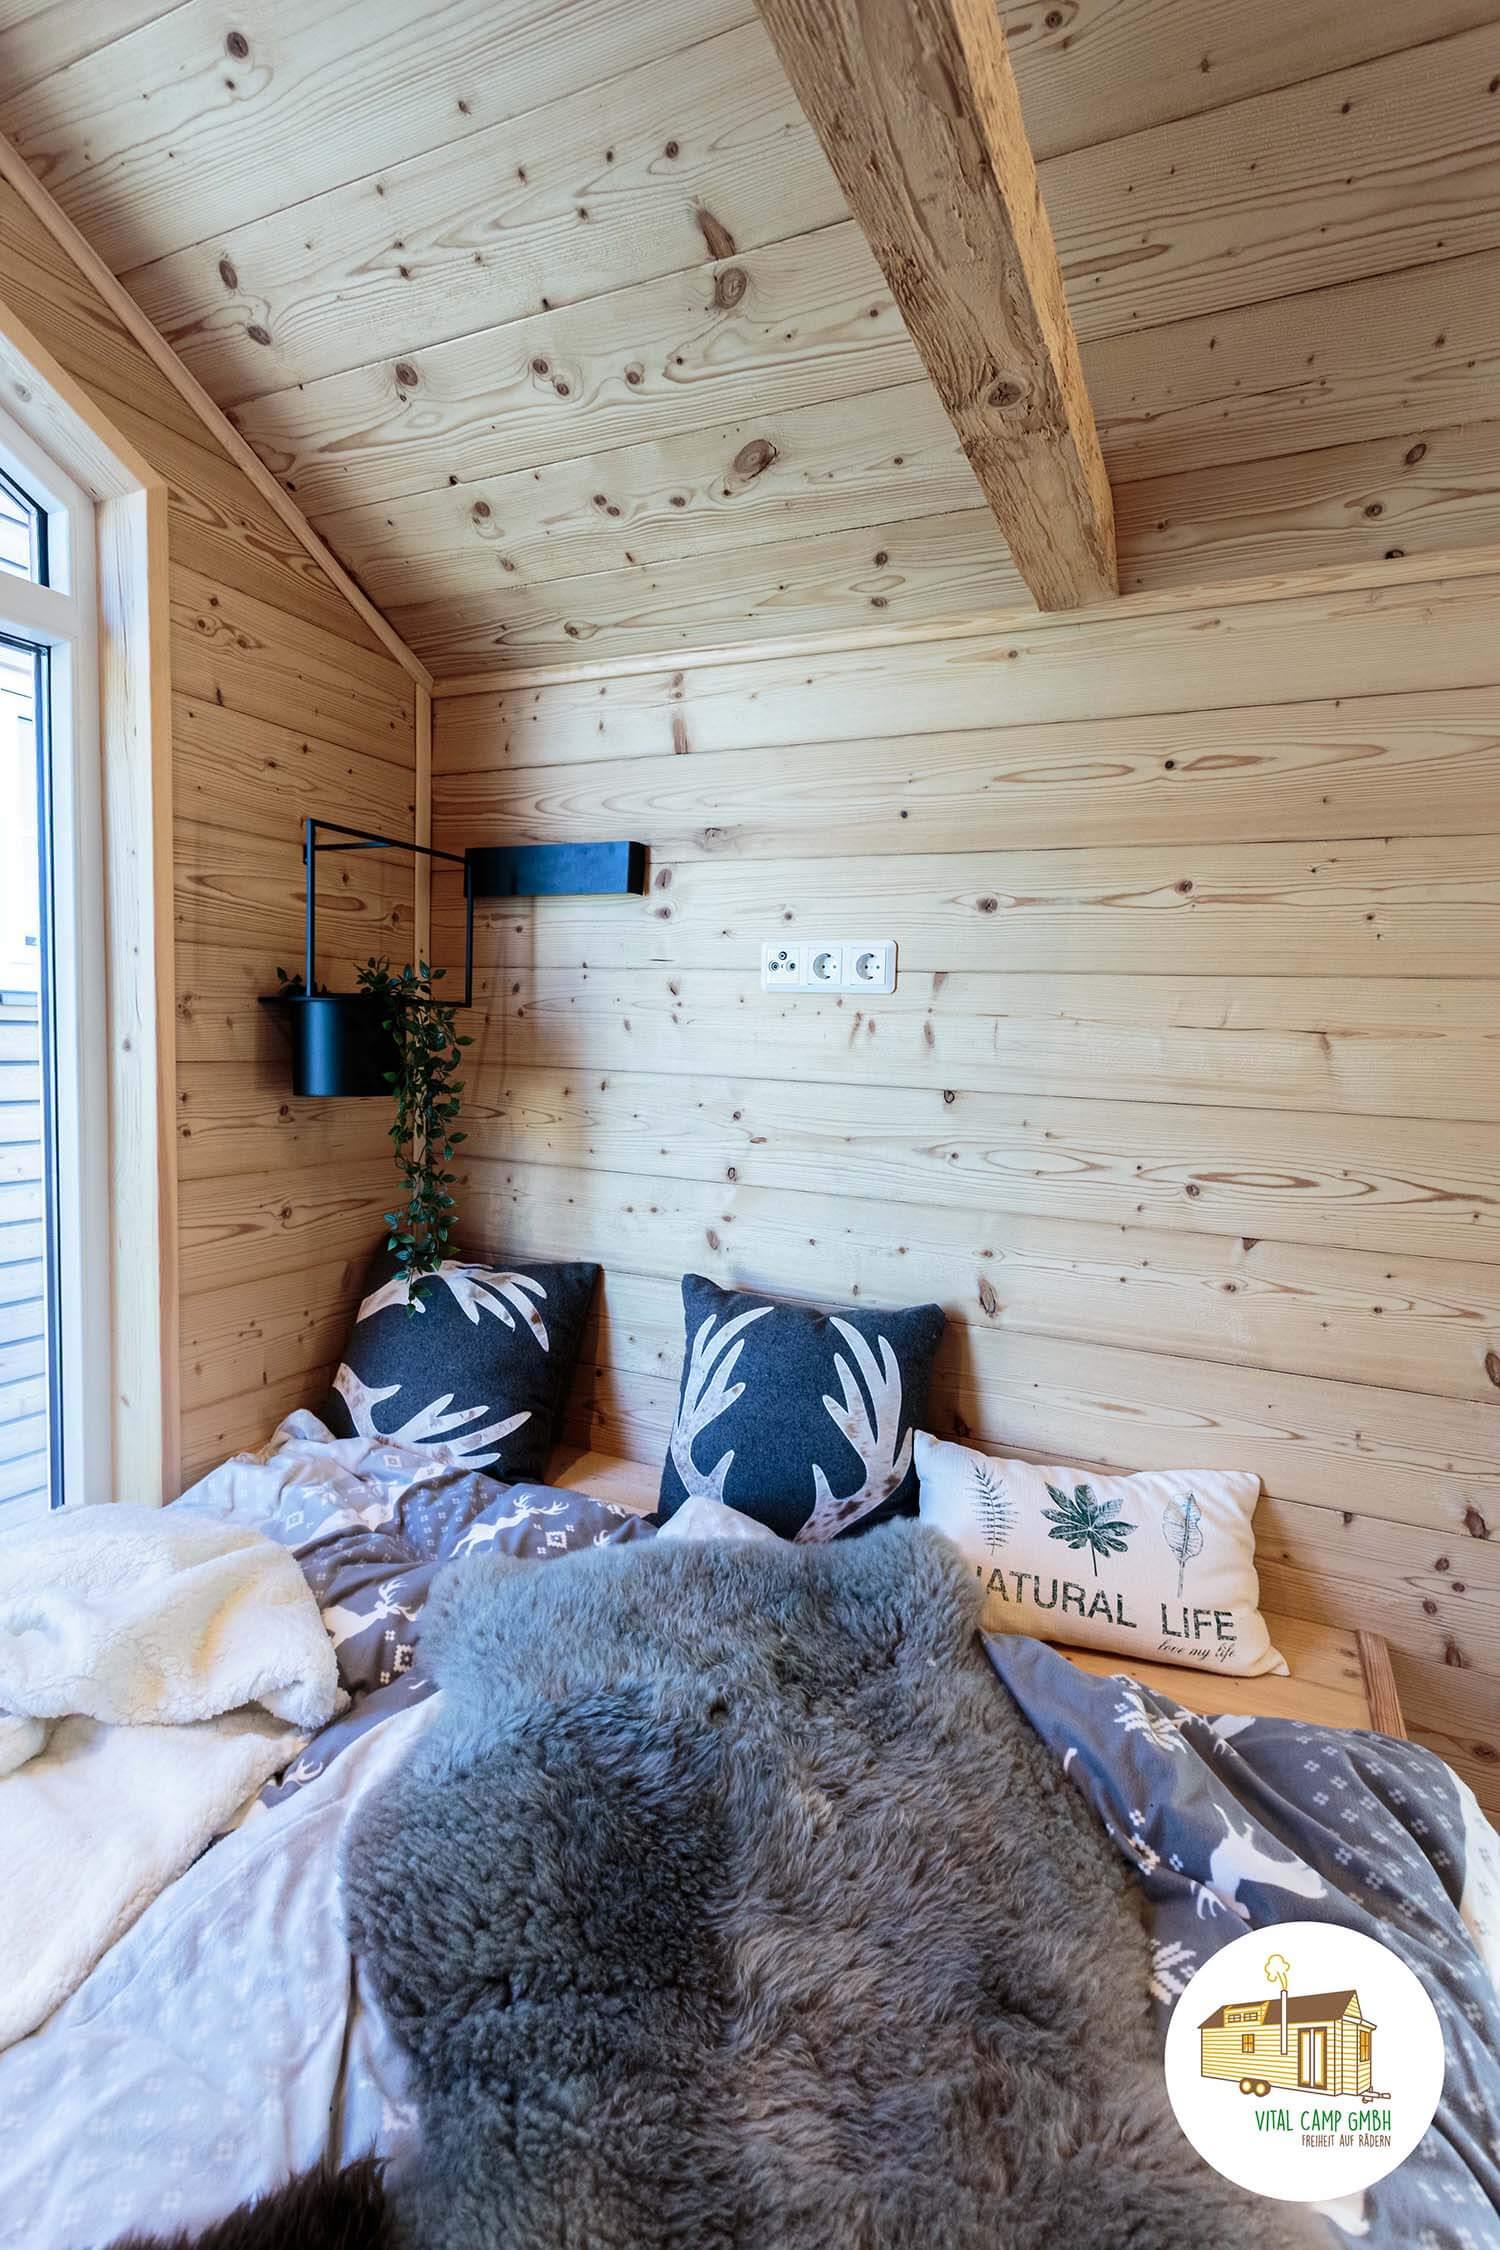 mobiles-chalet-finnland-vital-camp-gmbh-18